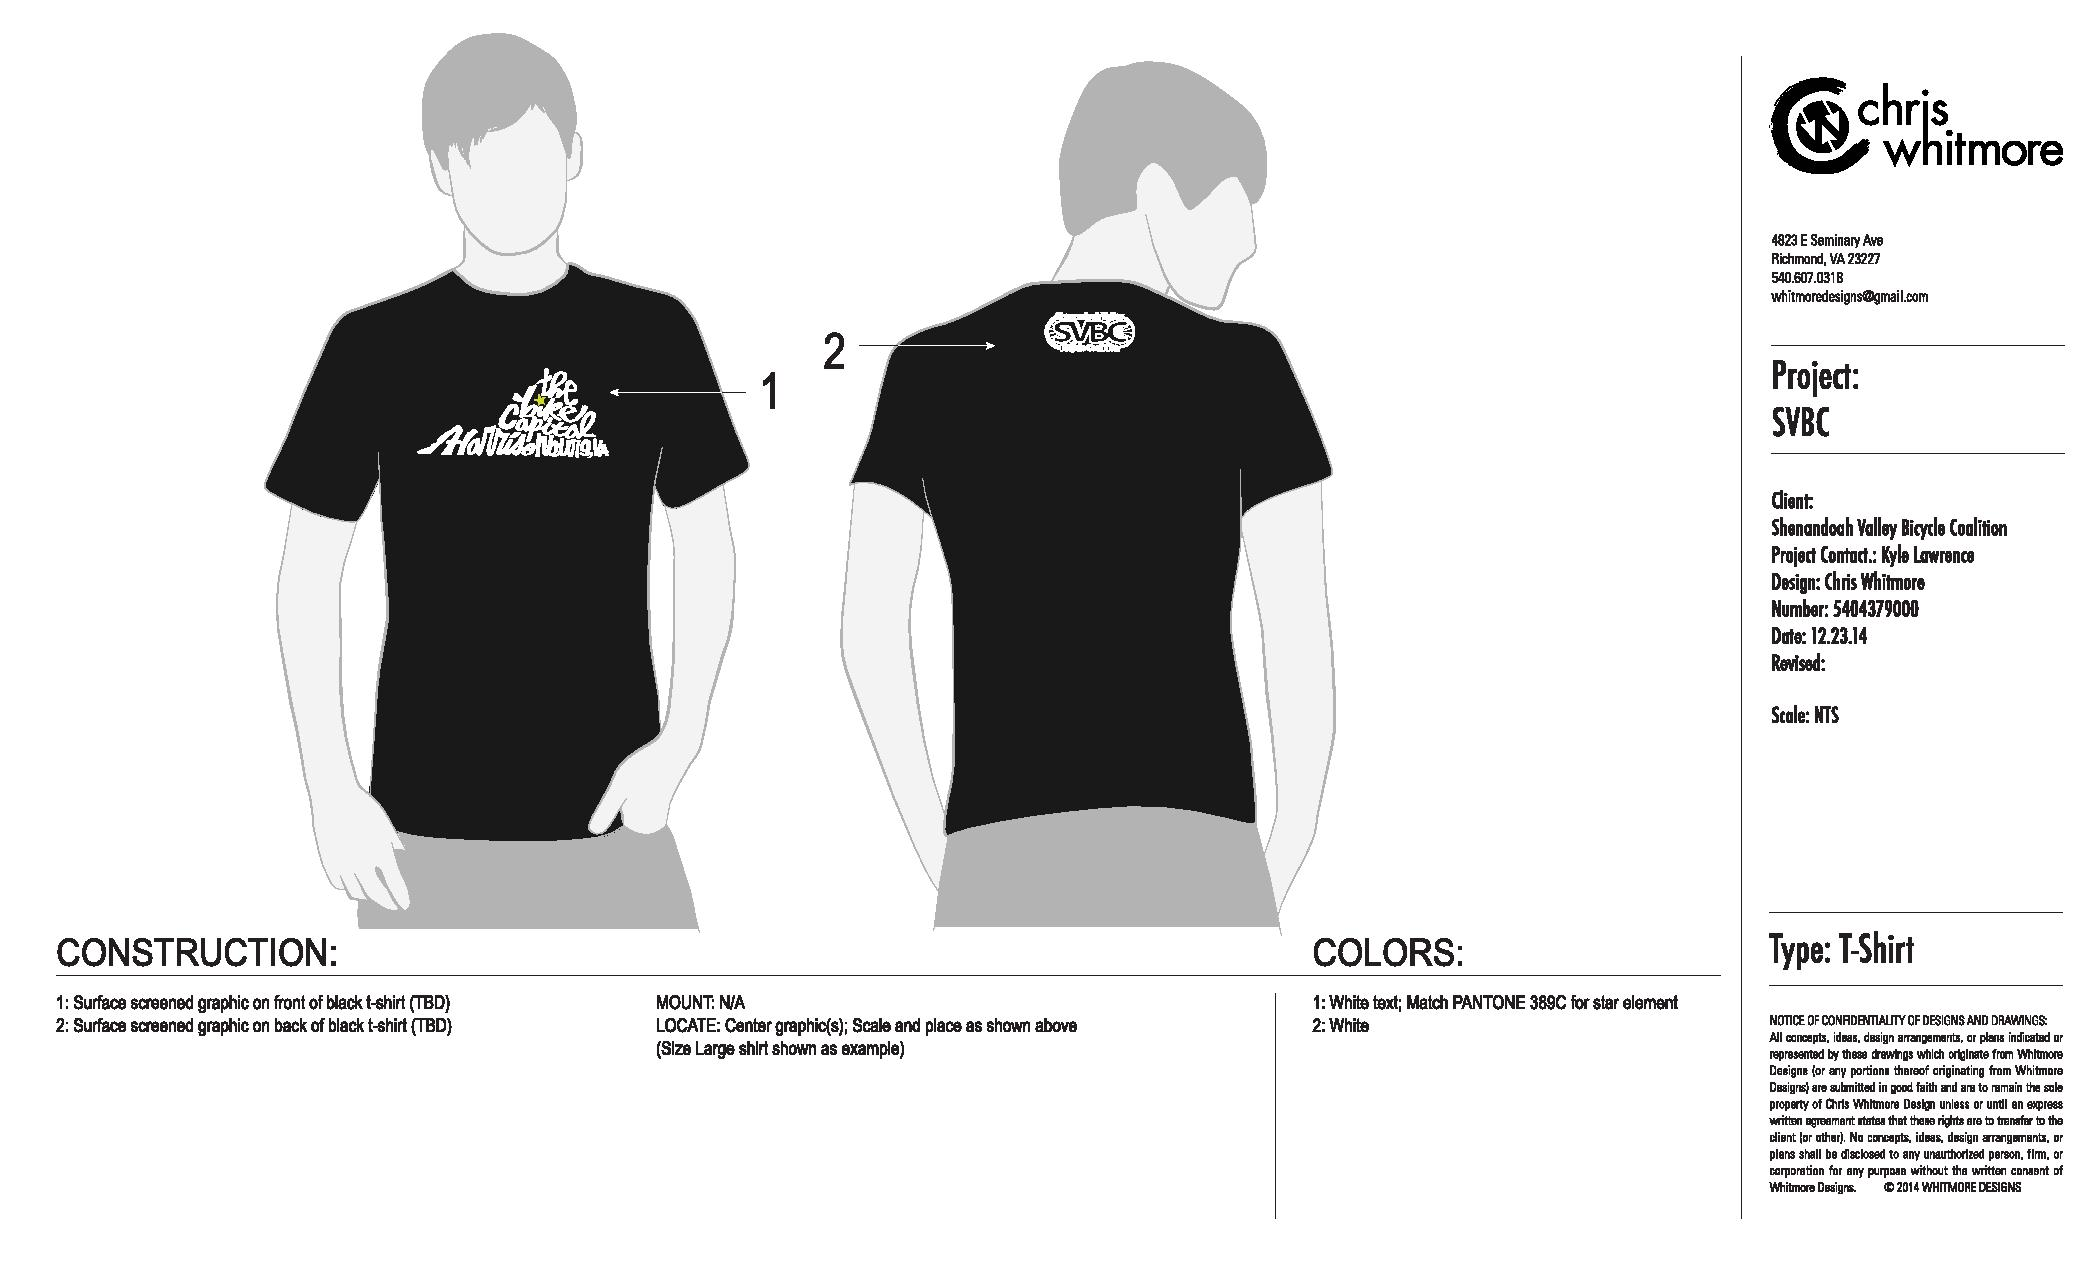 T shirt design richmond va - T Shirts The Bike Capital Harrisonburg Va